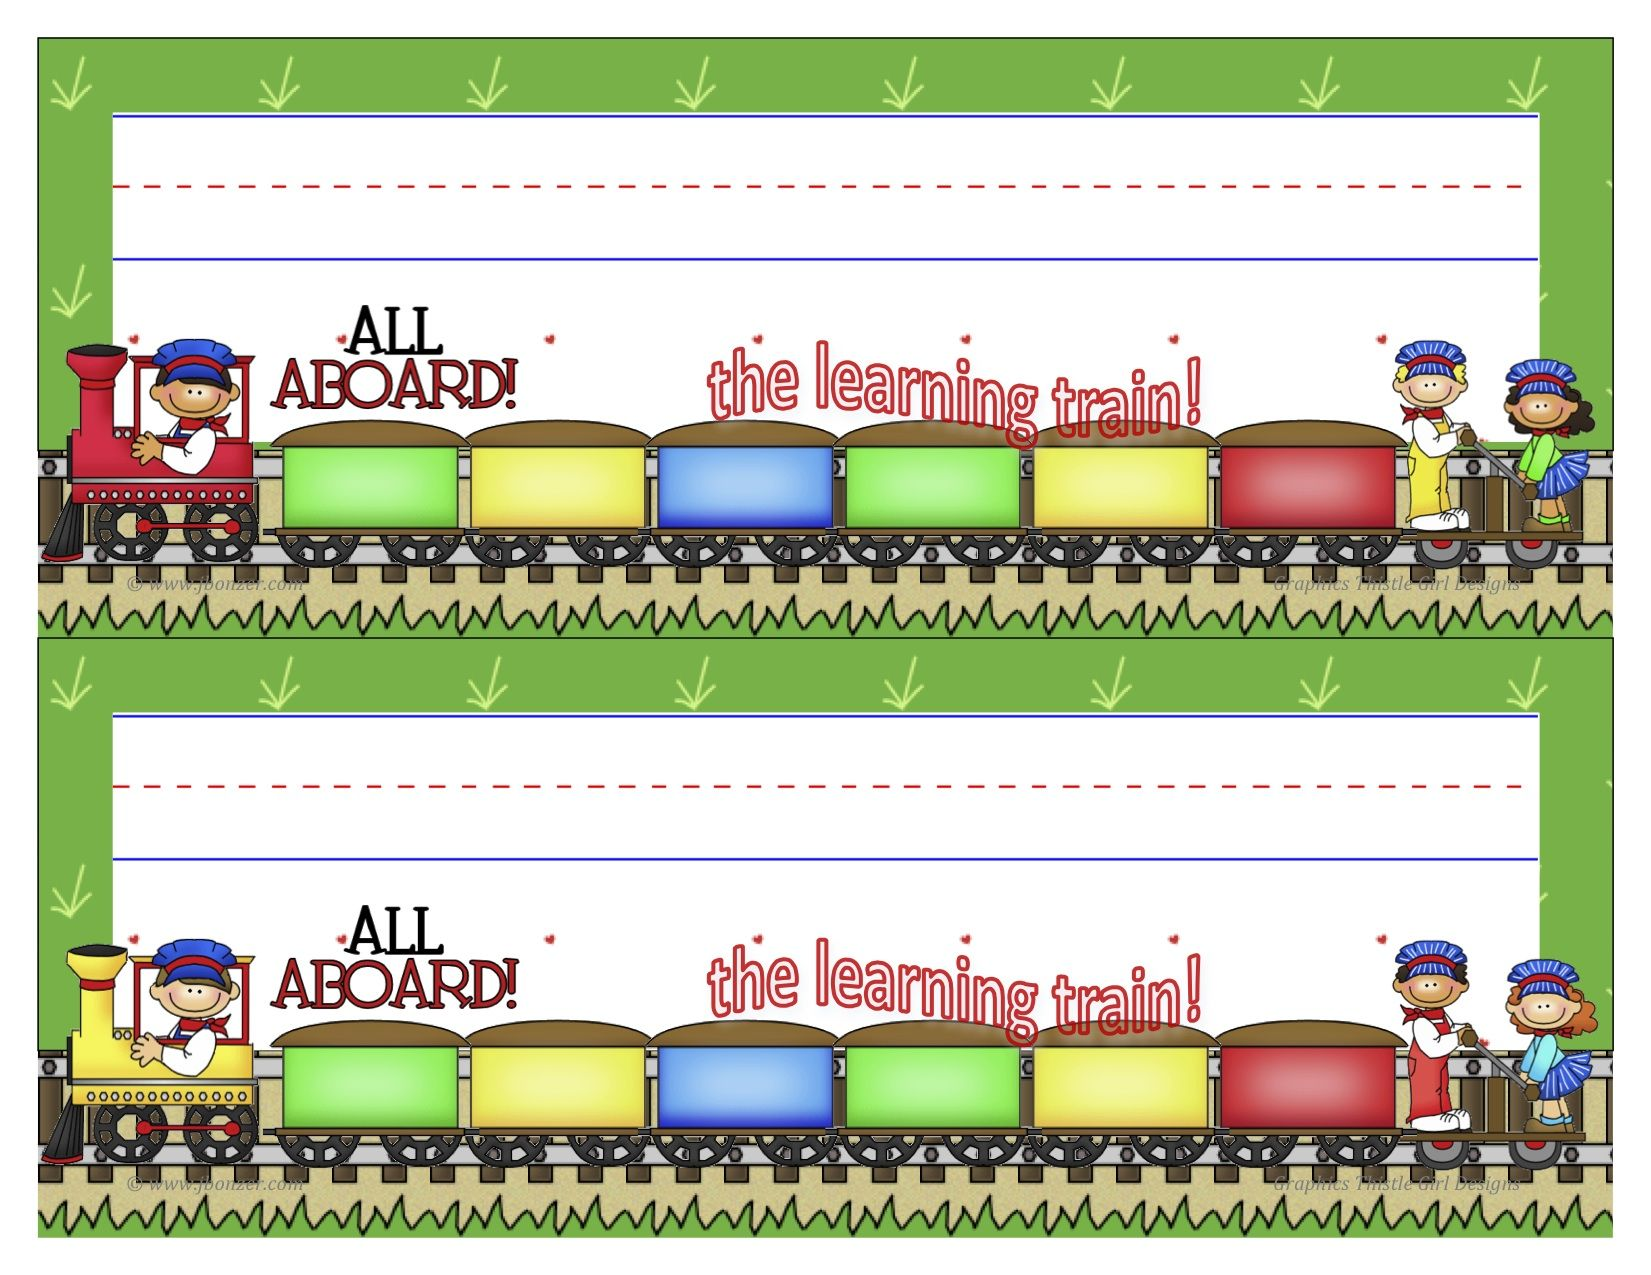 Jbonzer Trainnameplatebyjudybonzer